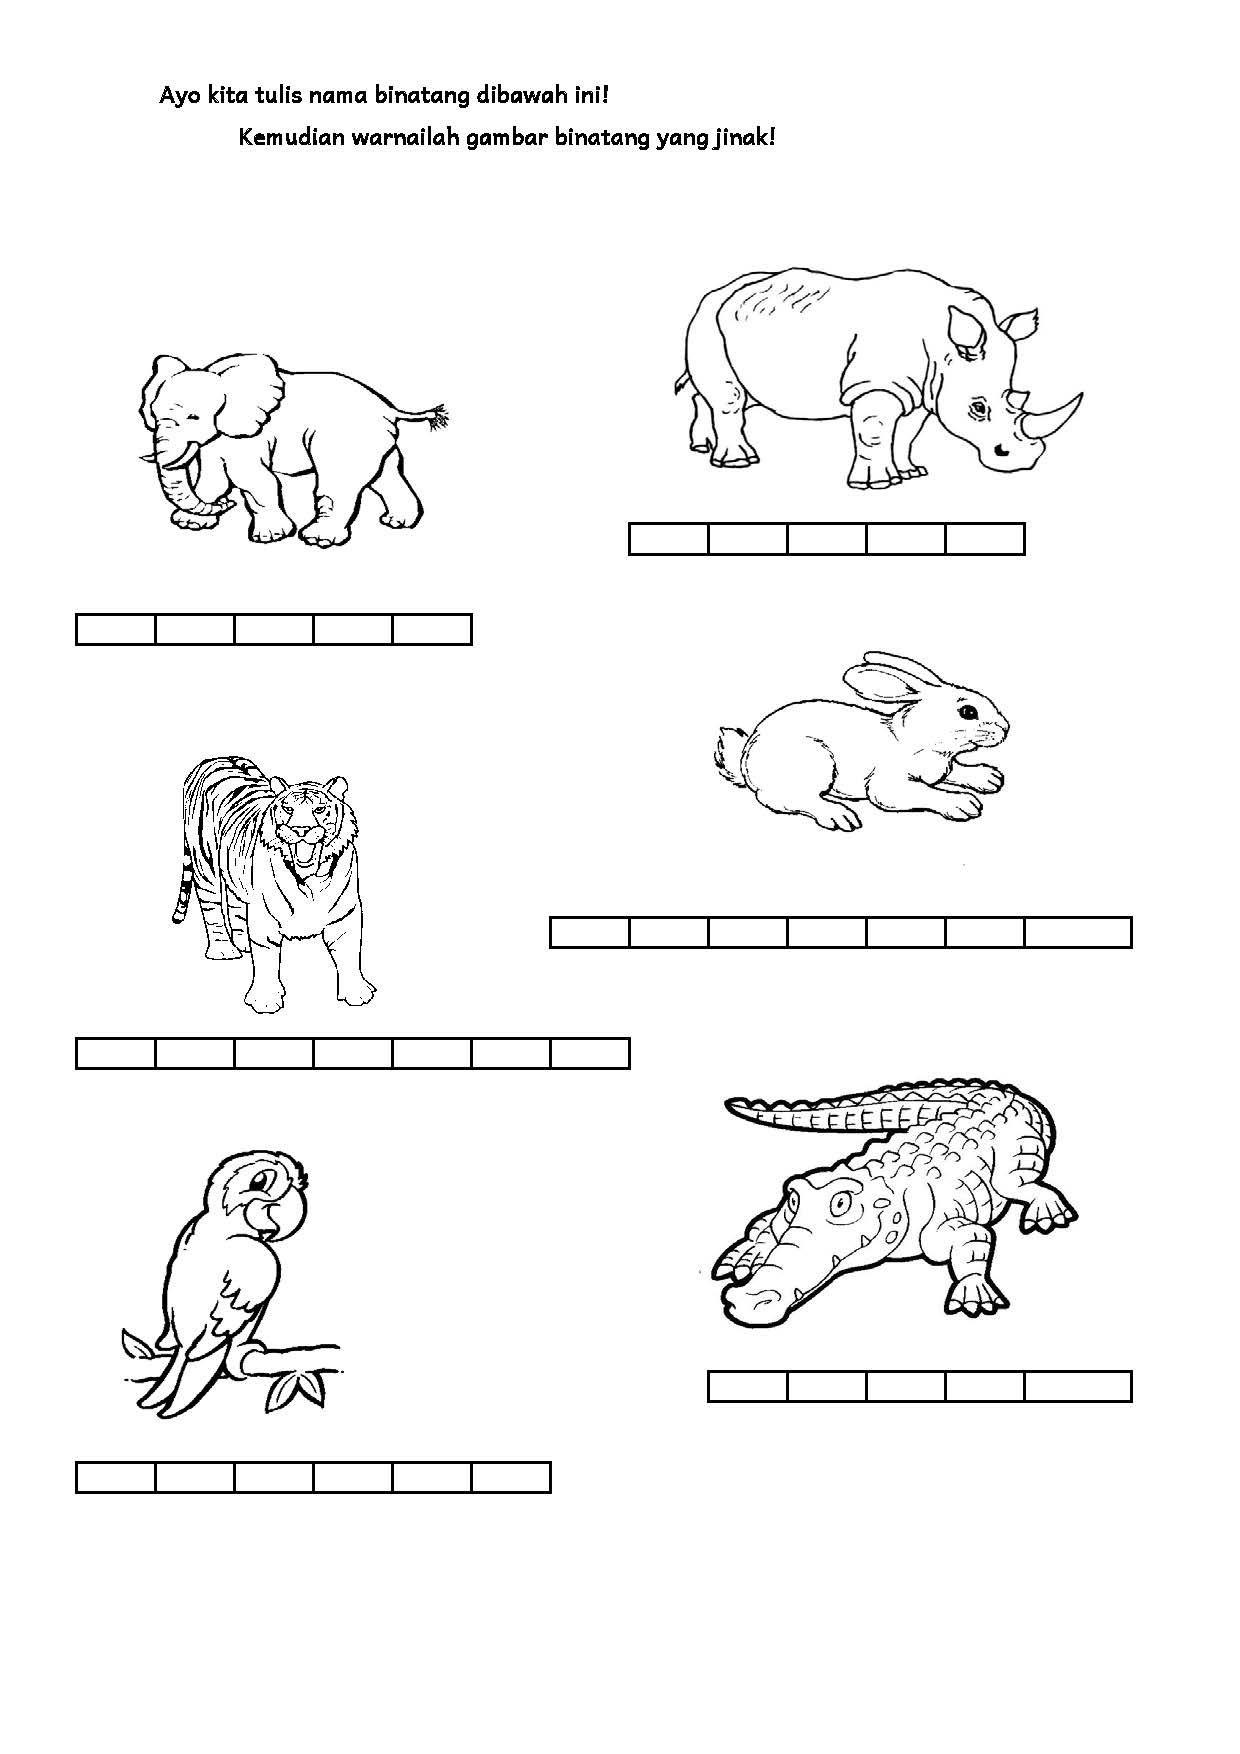 Di Kebun Binatang (Dengan gambar) Lembar kerja, Membaca